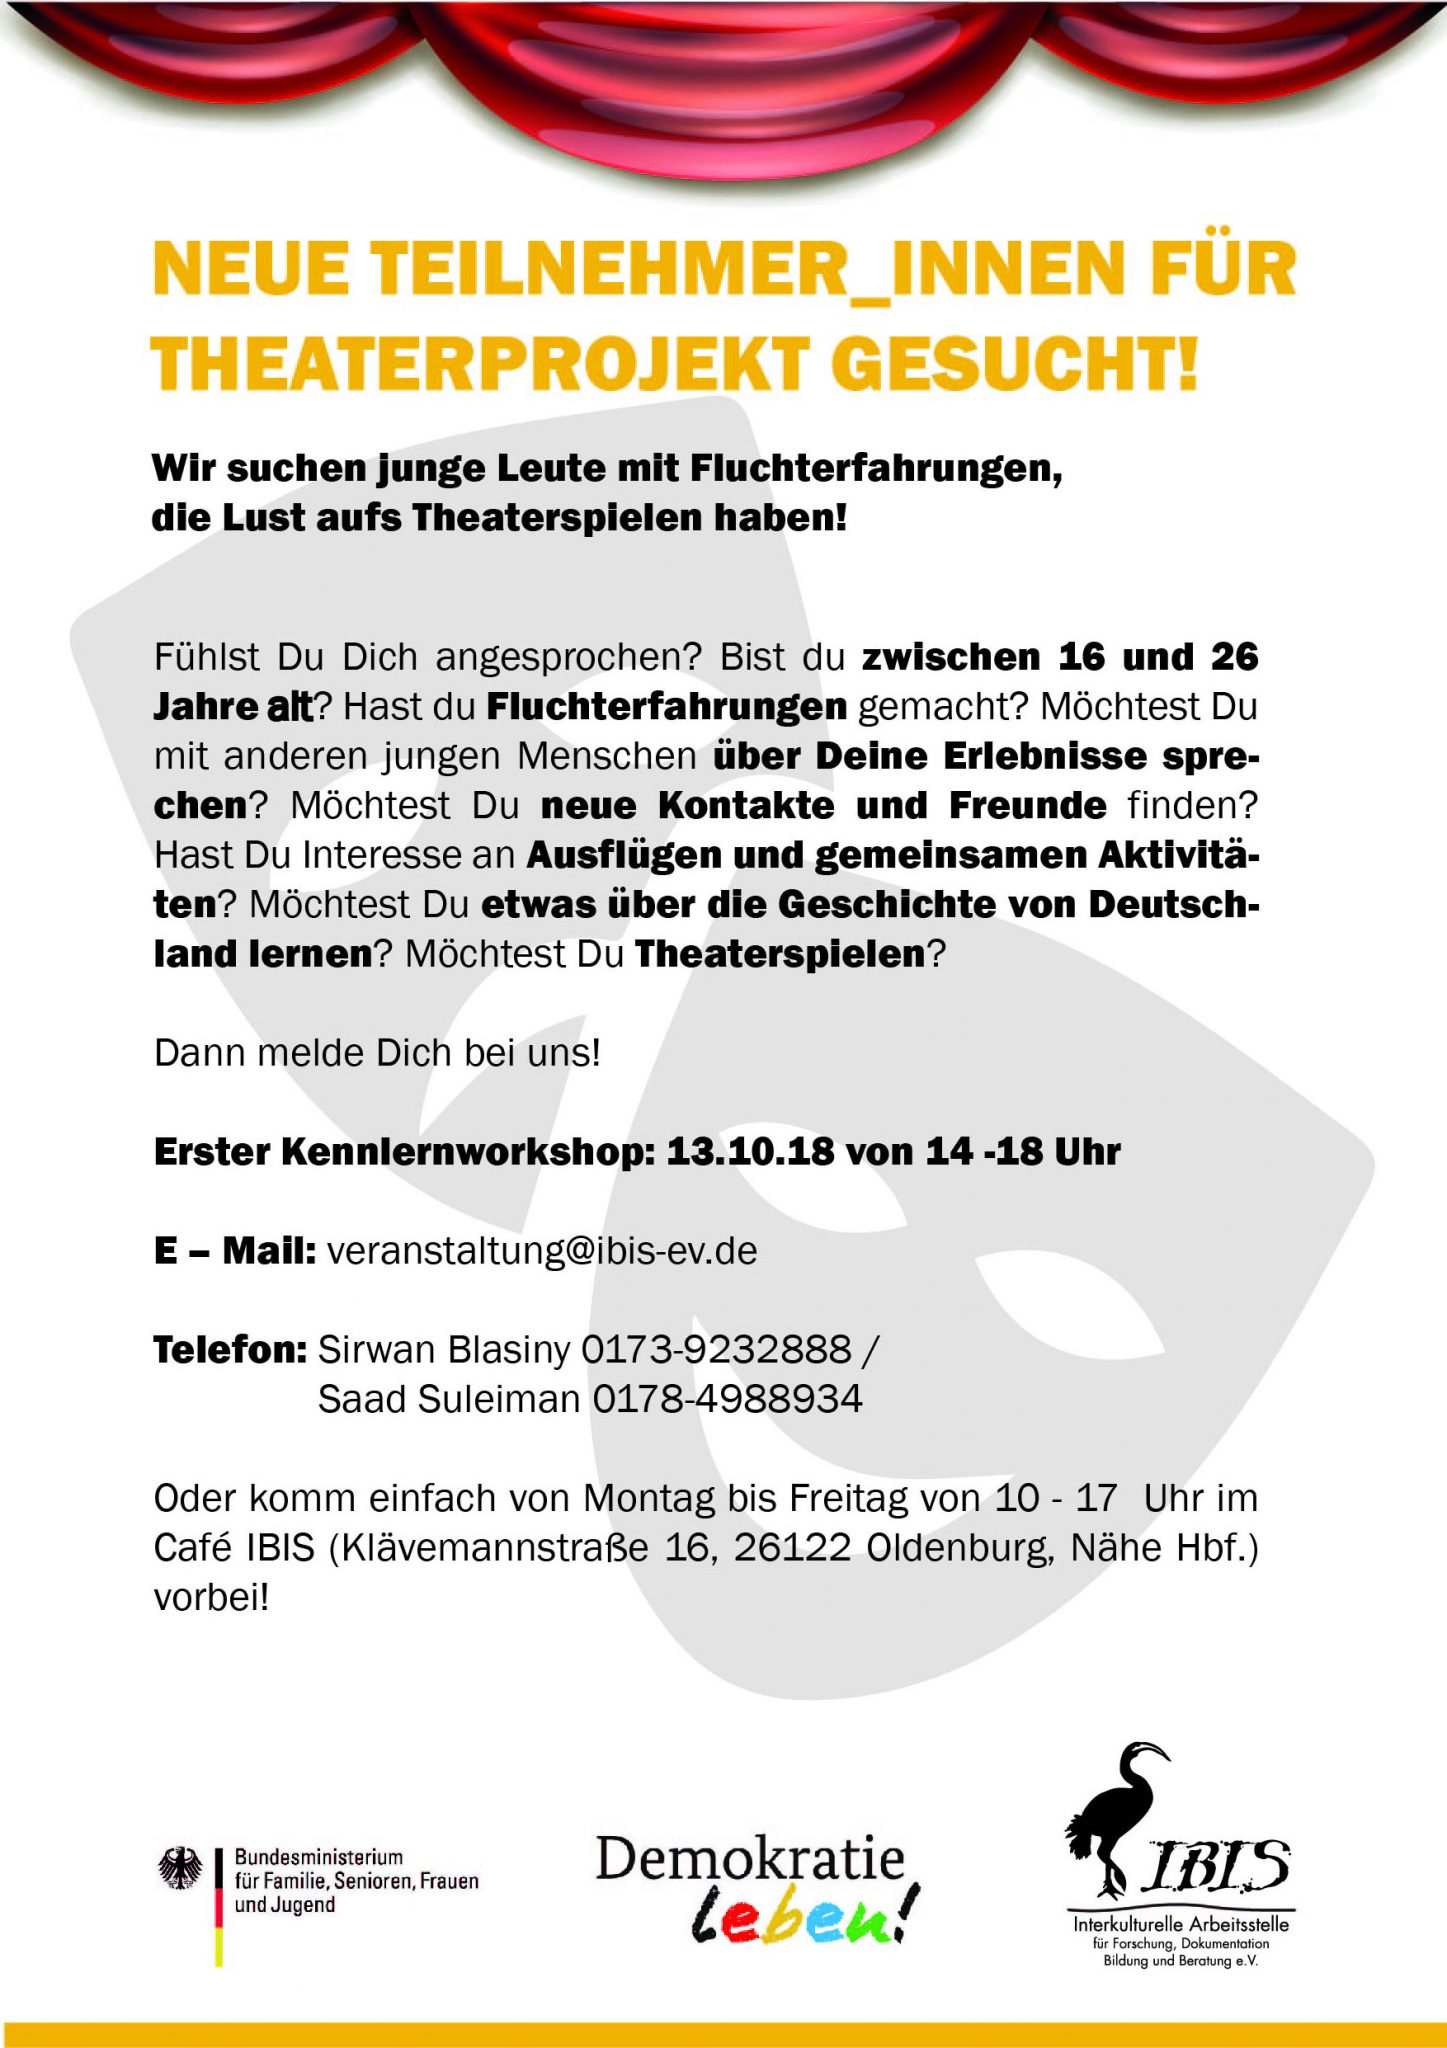 Theaterprojekt 2018/2019